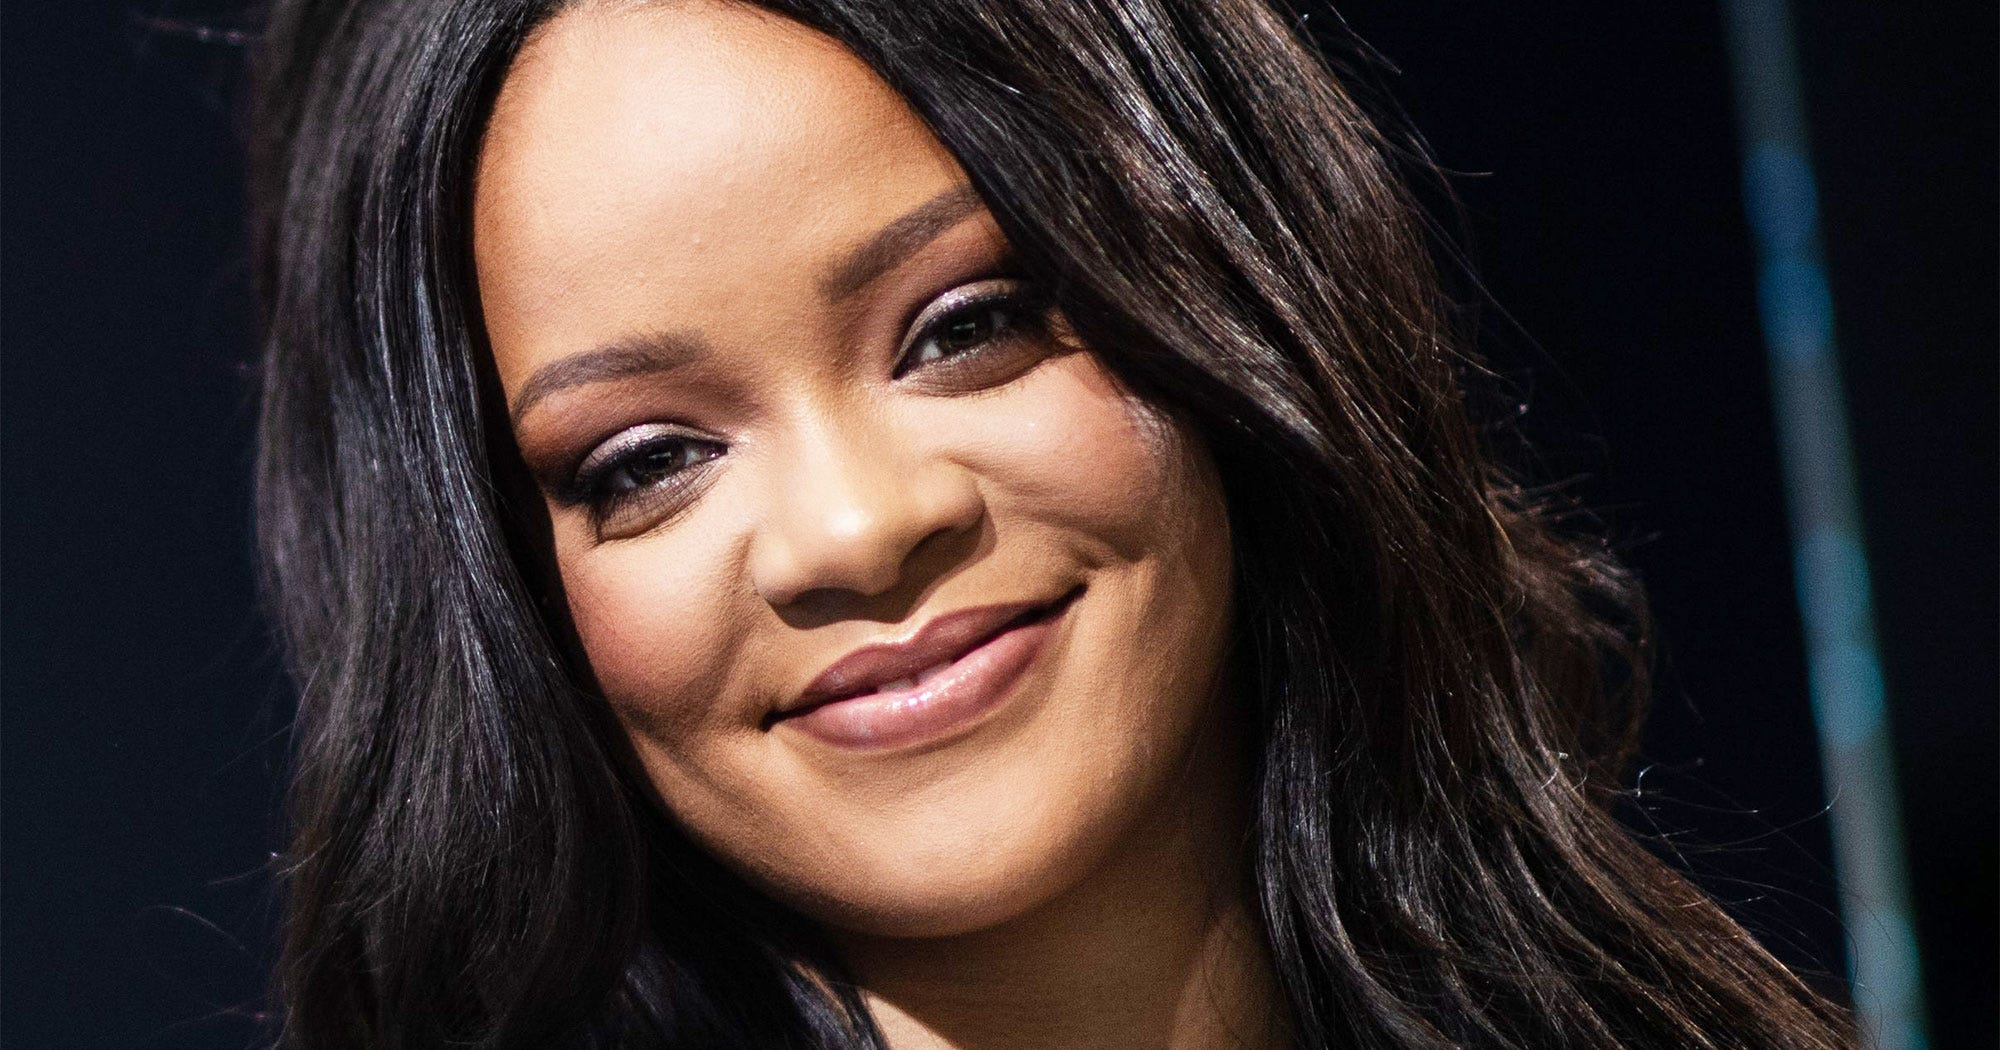 Rihanna Net Worth 2019... Rihanna Net Worth 2015 Forbes